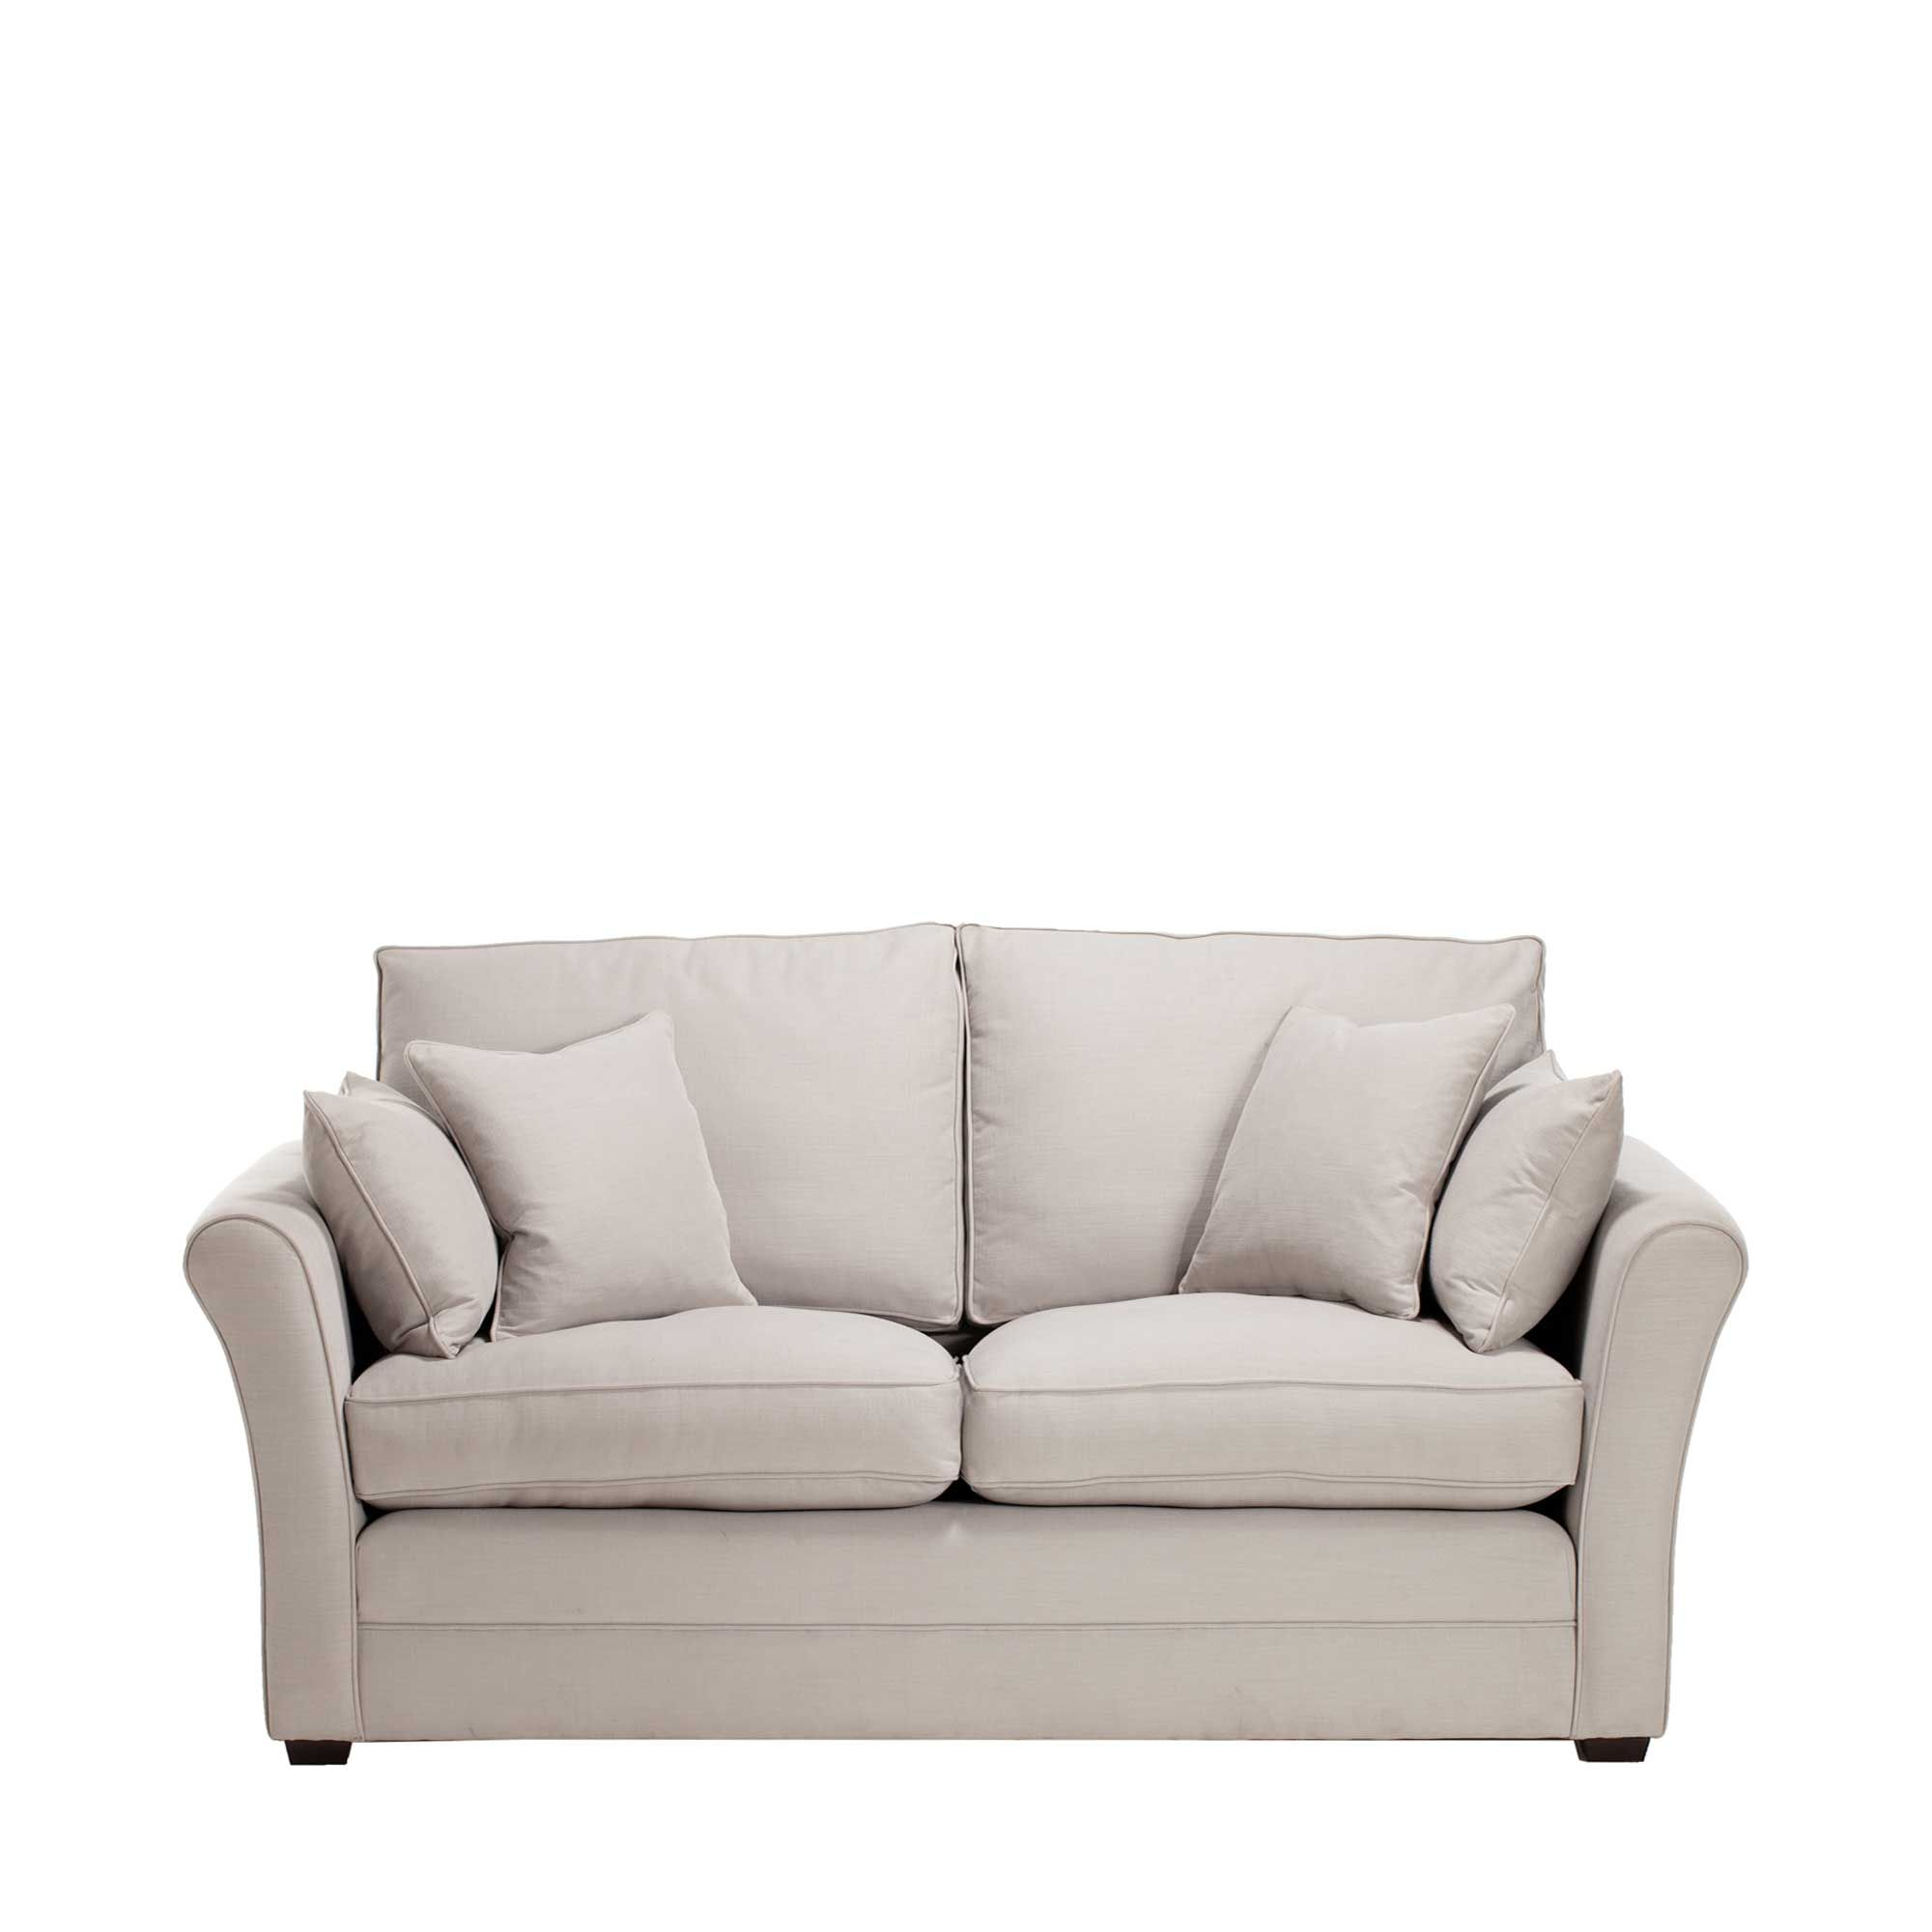 Berkeley Small Fabric Sofa | 2 Seater Sofas - Barker ...